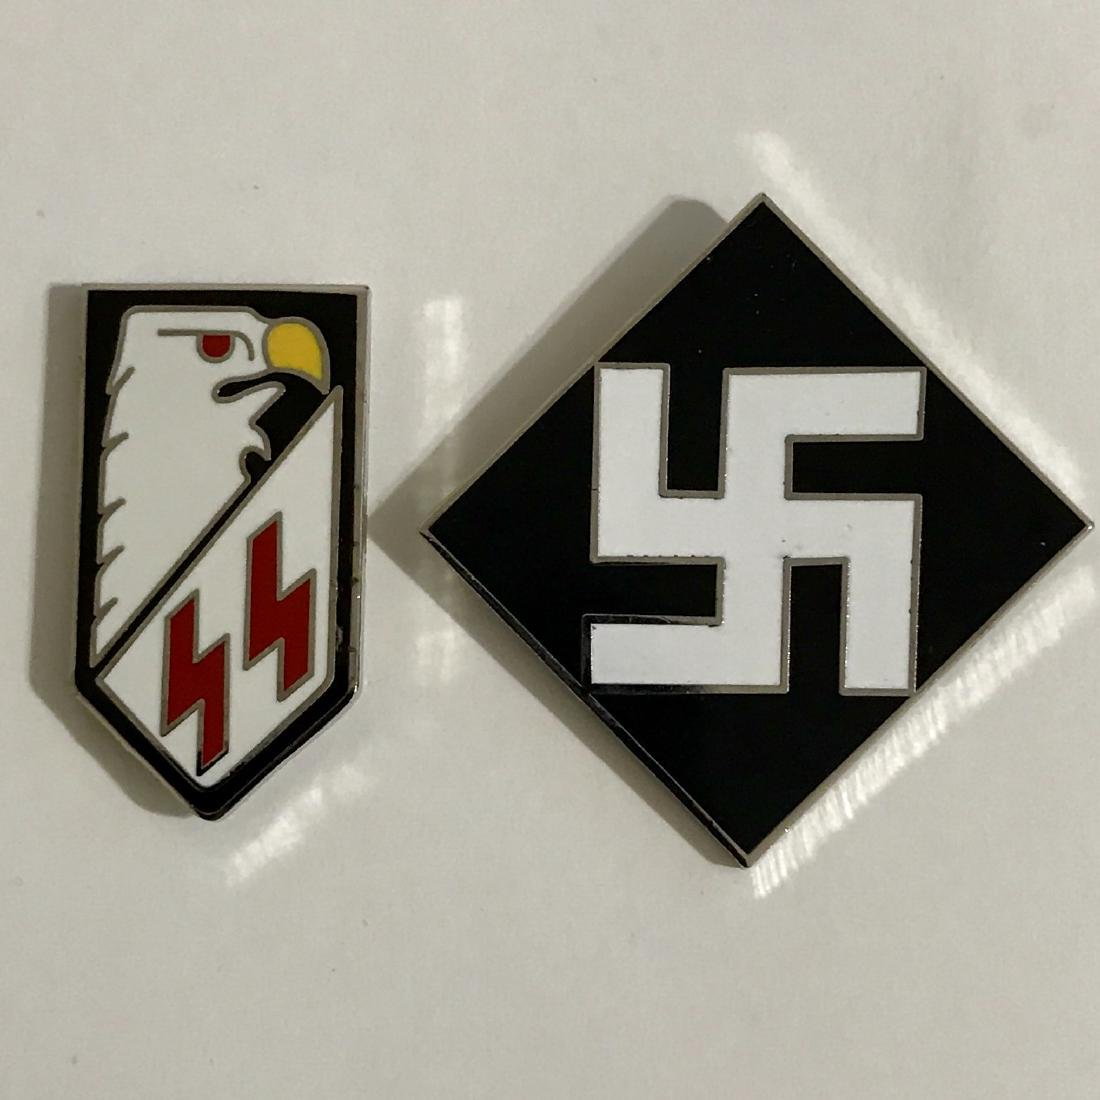 Lot of 2 Enamel Nazi Germany Uniform/Gestapo Pins